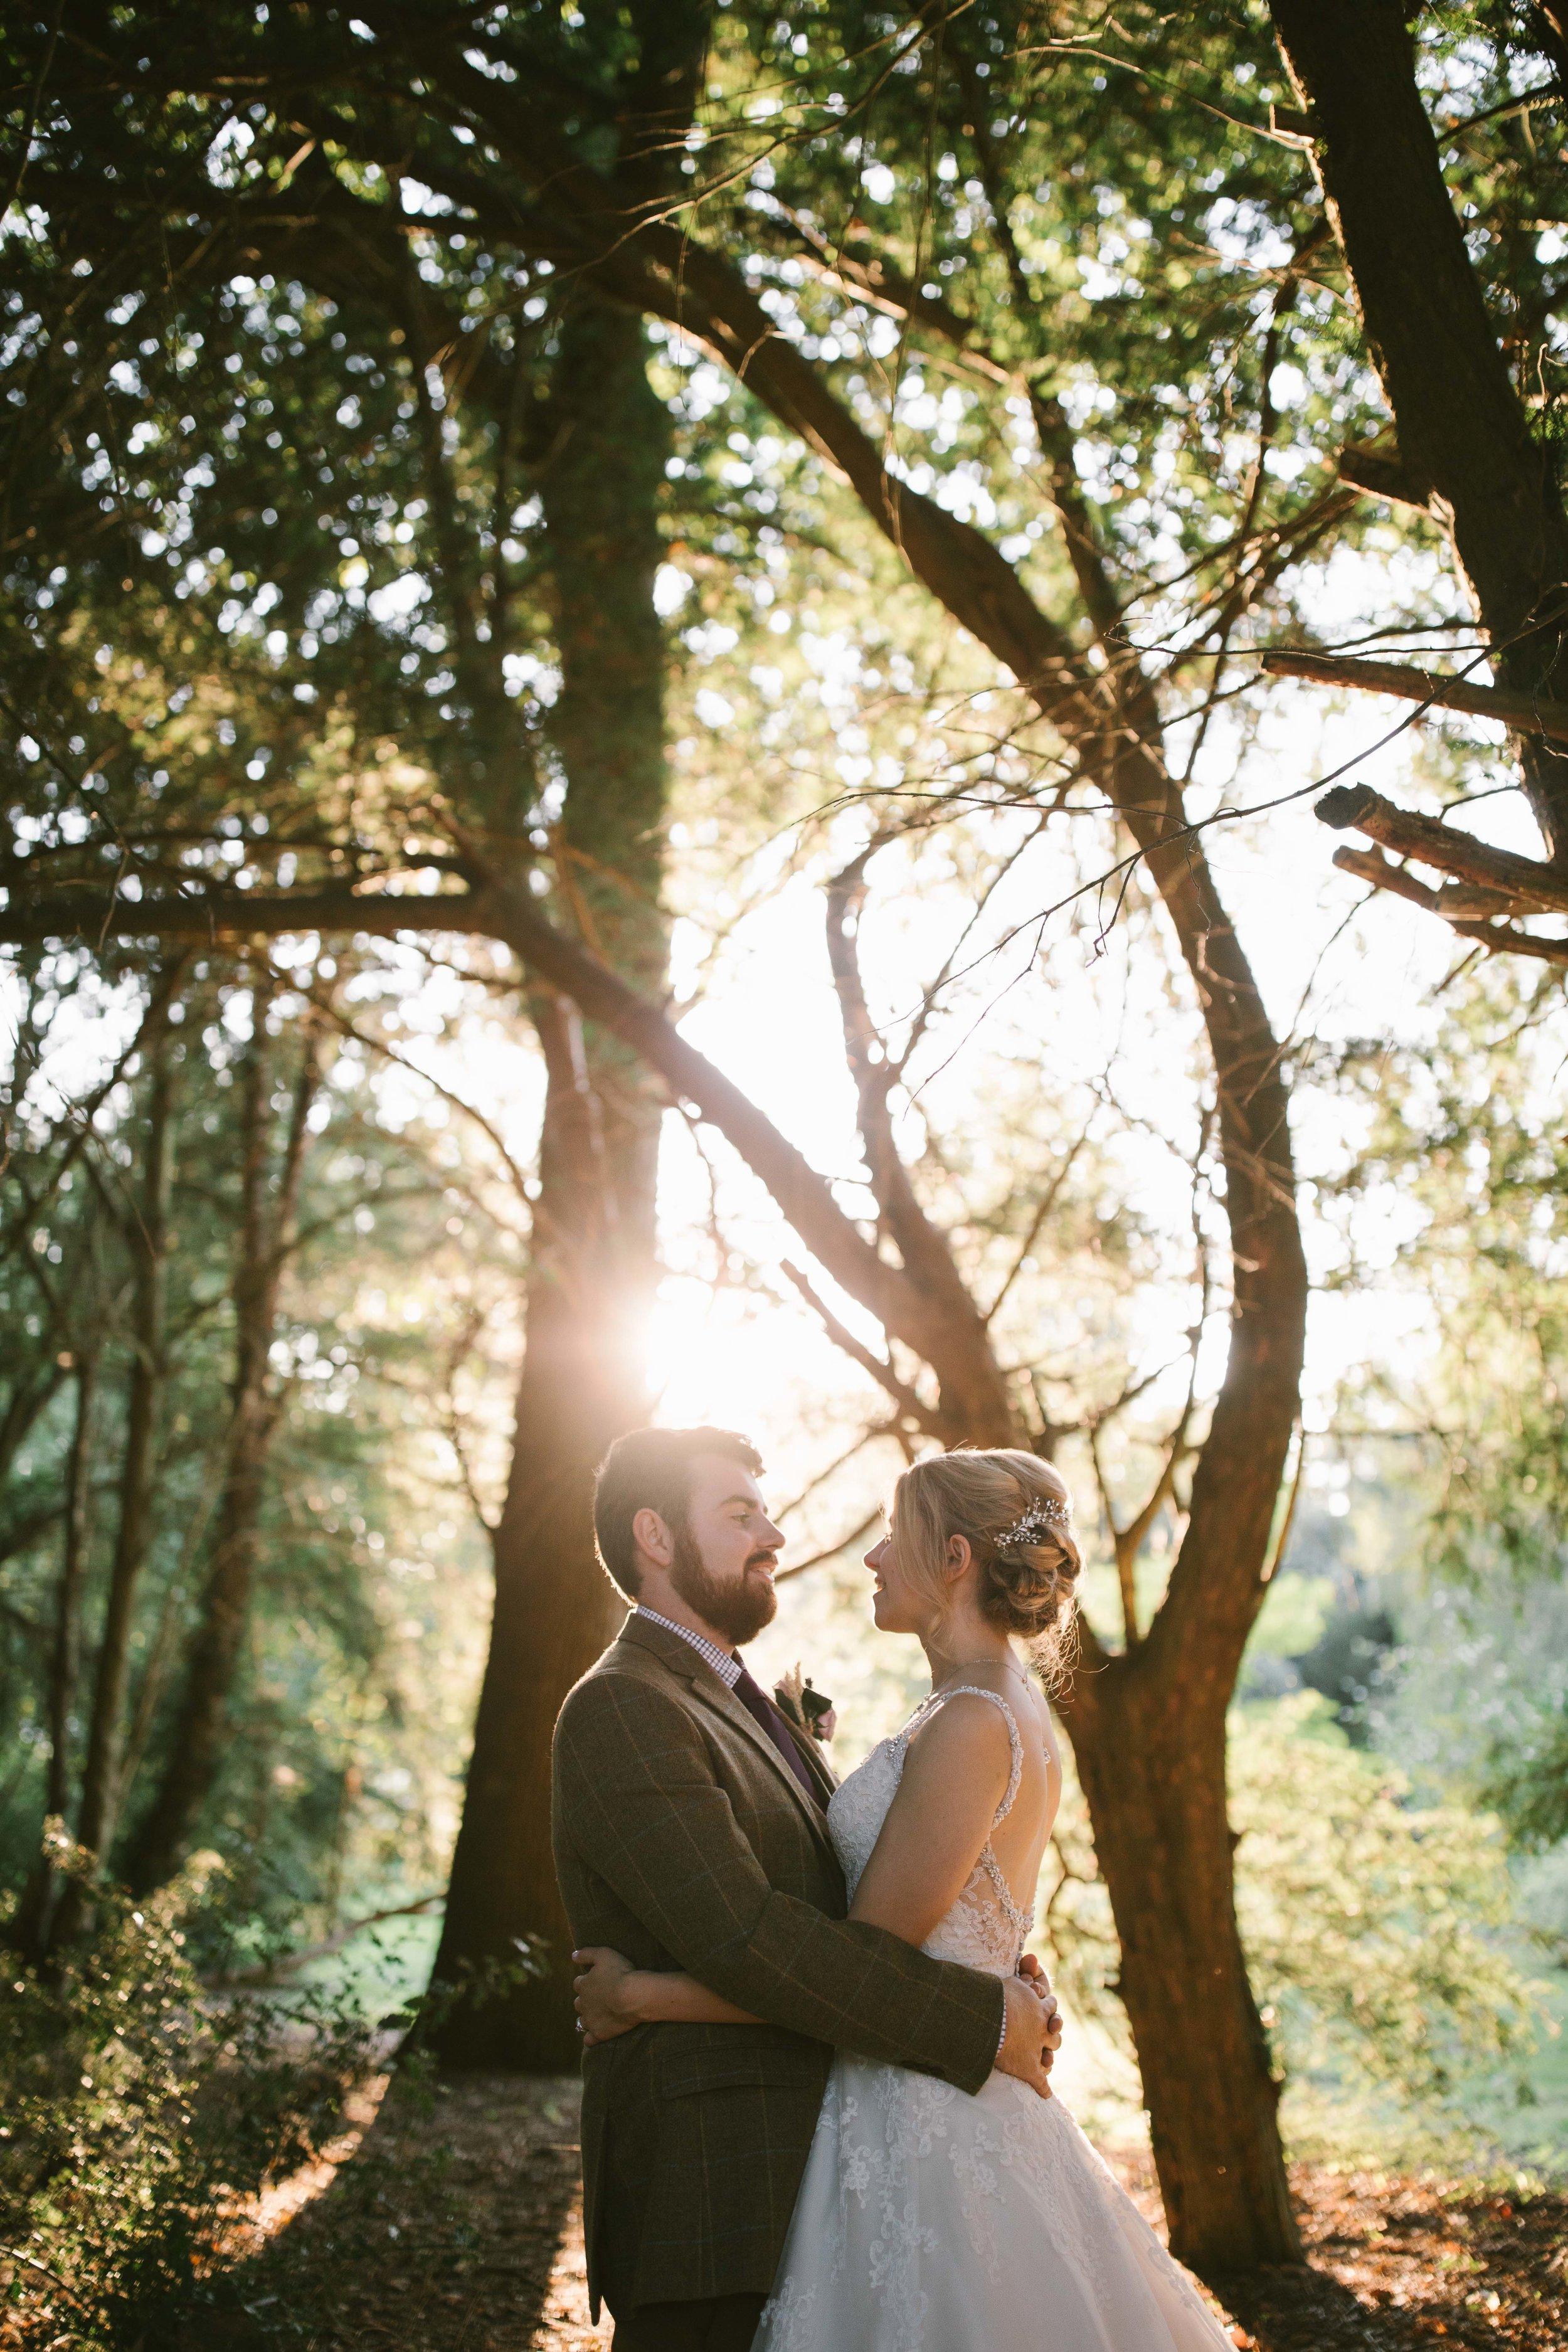 Jo & Sam Birling Woods Kent Wedding Photography-86.jpg